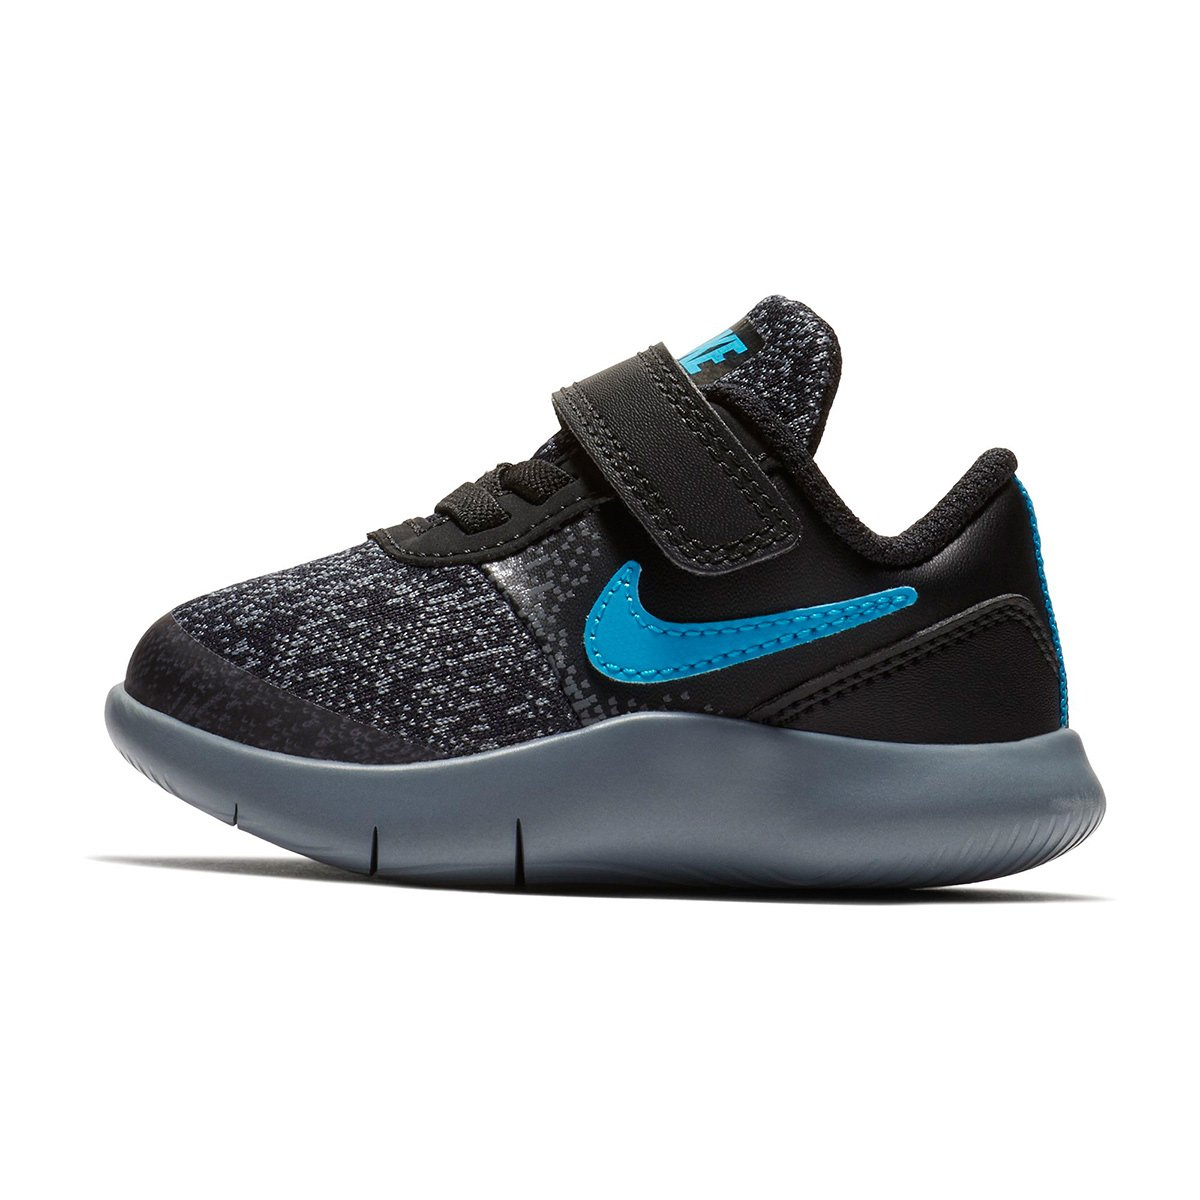 397f9593b8 Tênis Infantil Nike Flex Contact Masculino - Preto e Cinza - Compre ...